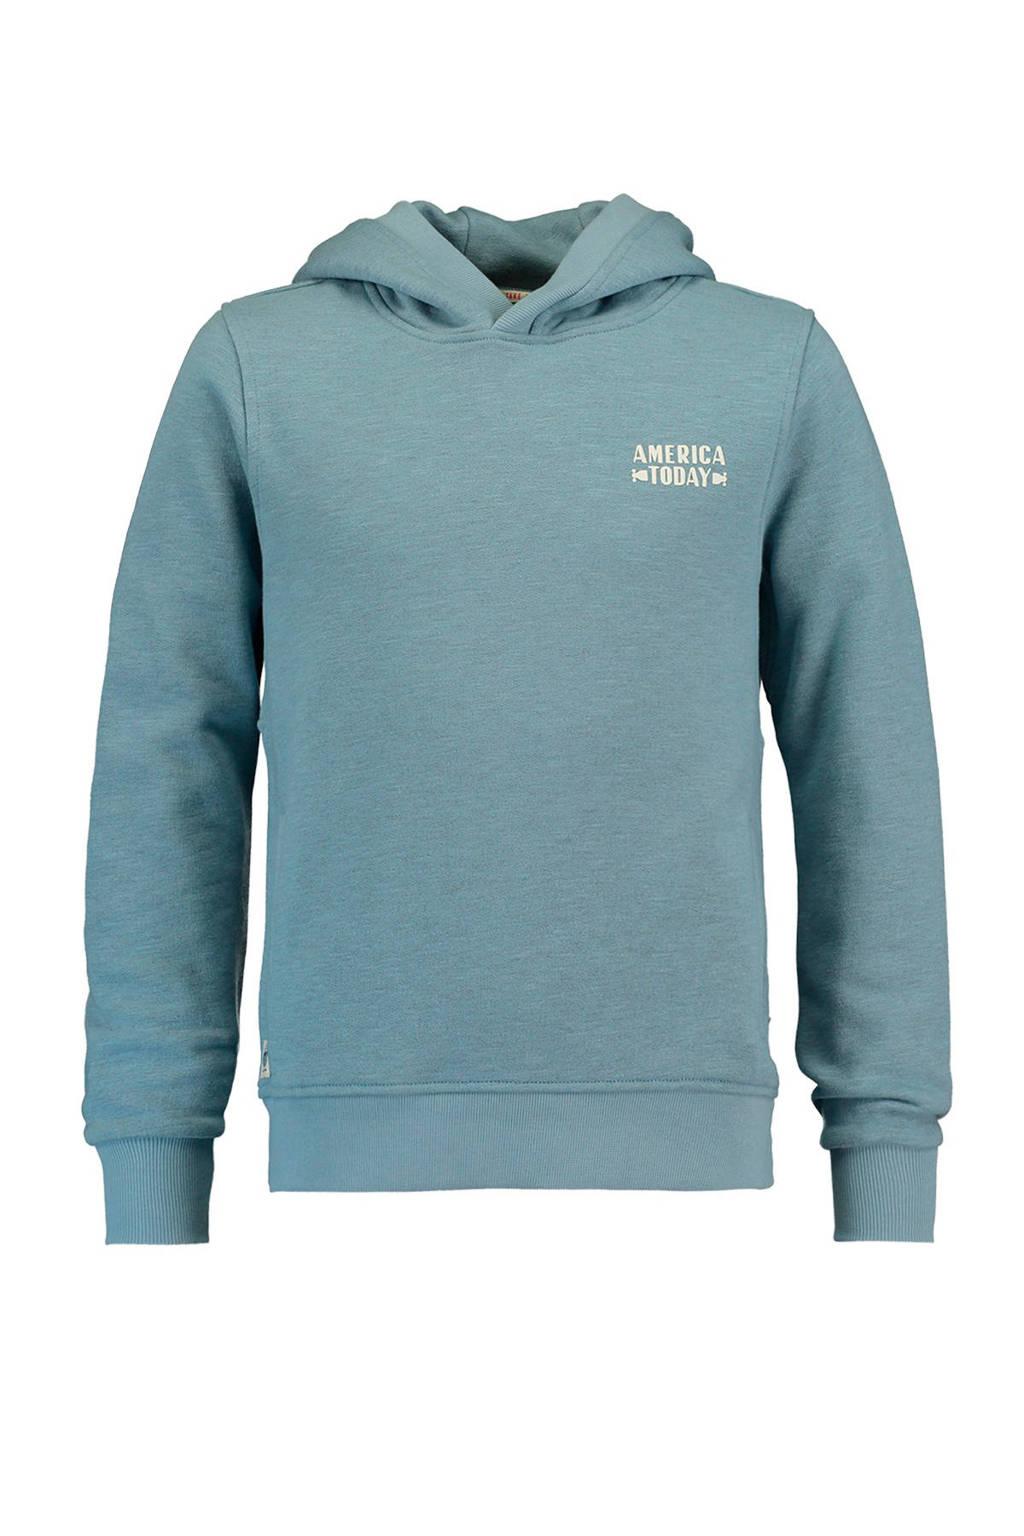 America Today Junior hoodie Stef met print blauw, Blauw